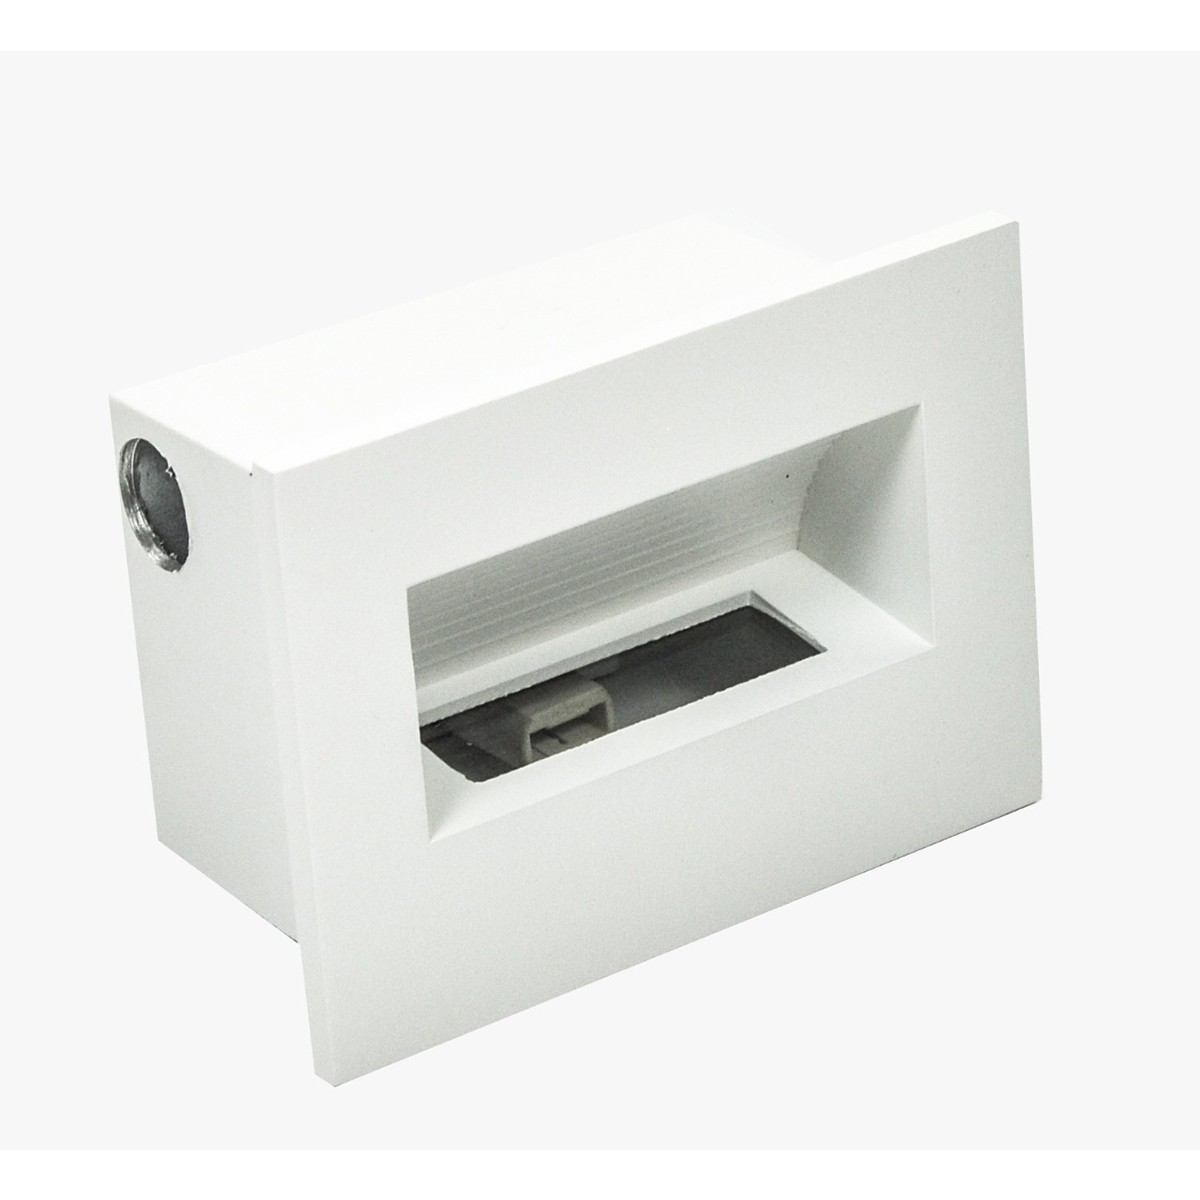 Balizador Embutir 2g9 Retangular 13,3x9,7cm Branco